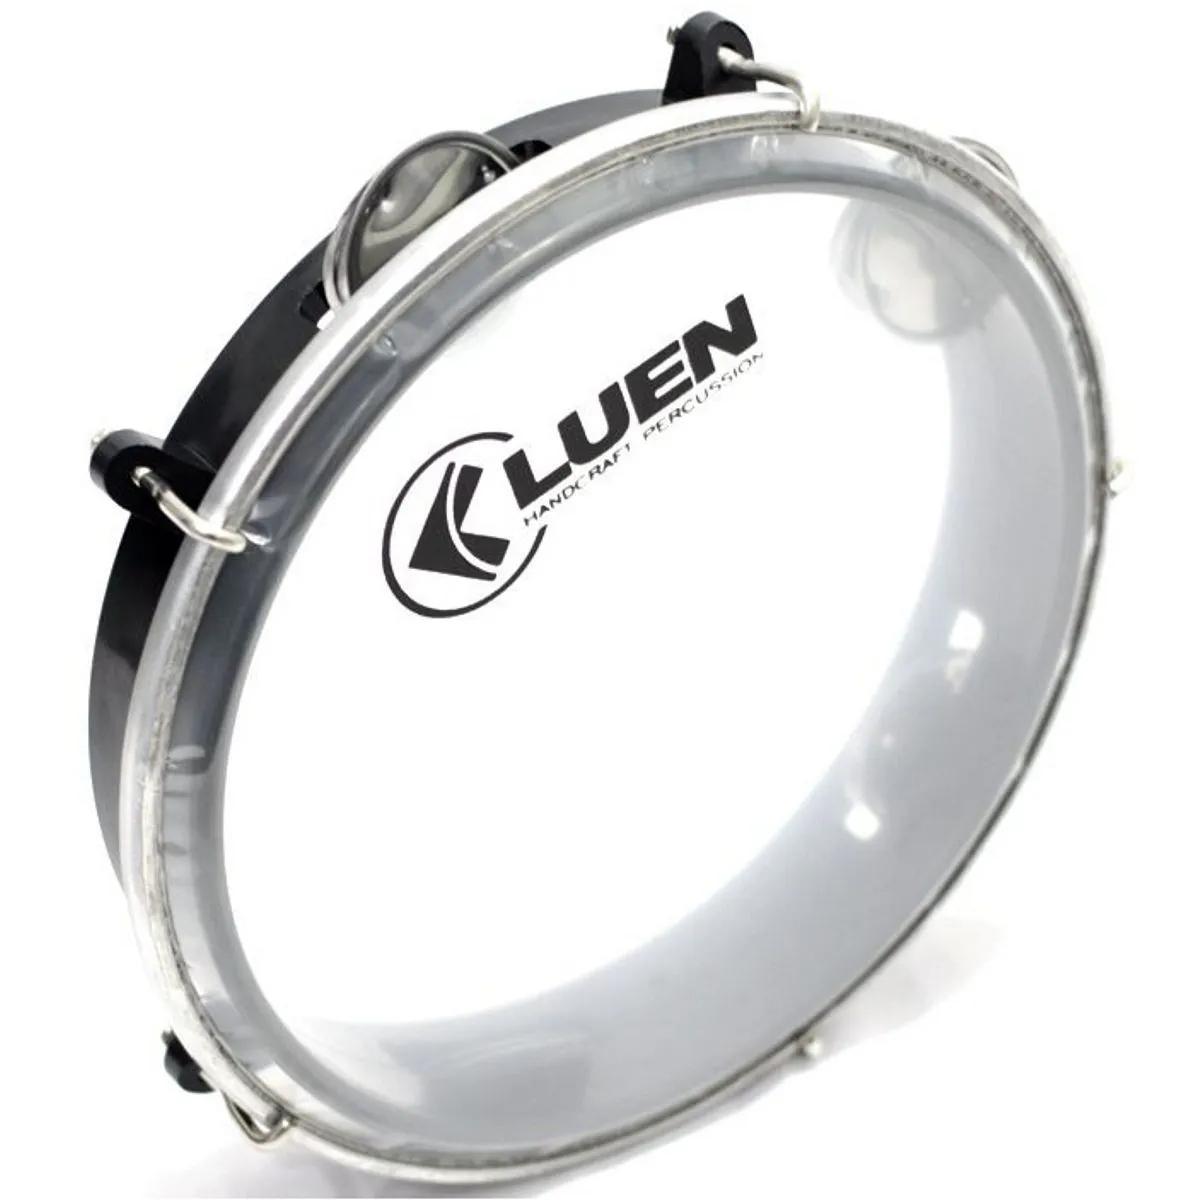 Pandeiro Junior Luen Percussion 8 Aro ABS Preto Pele Cristal